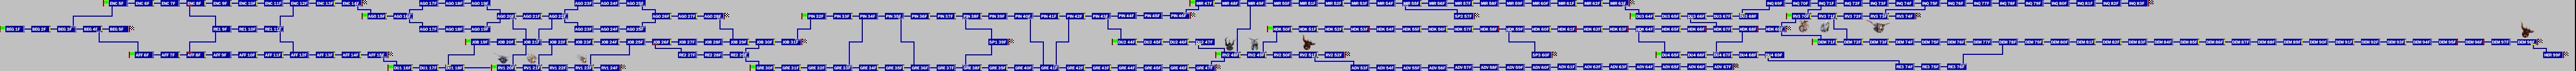 D012 Labyrinth map